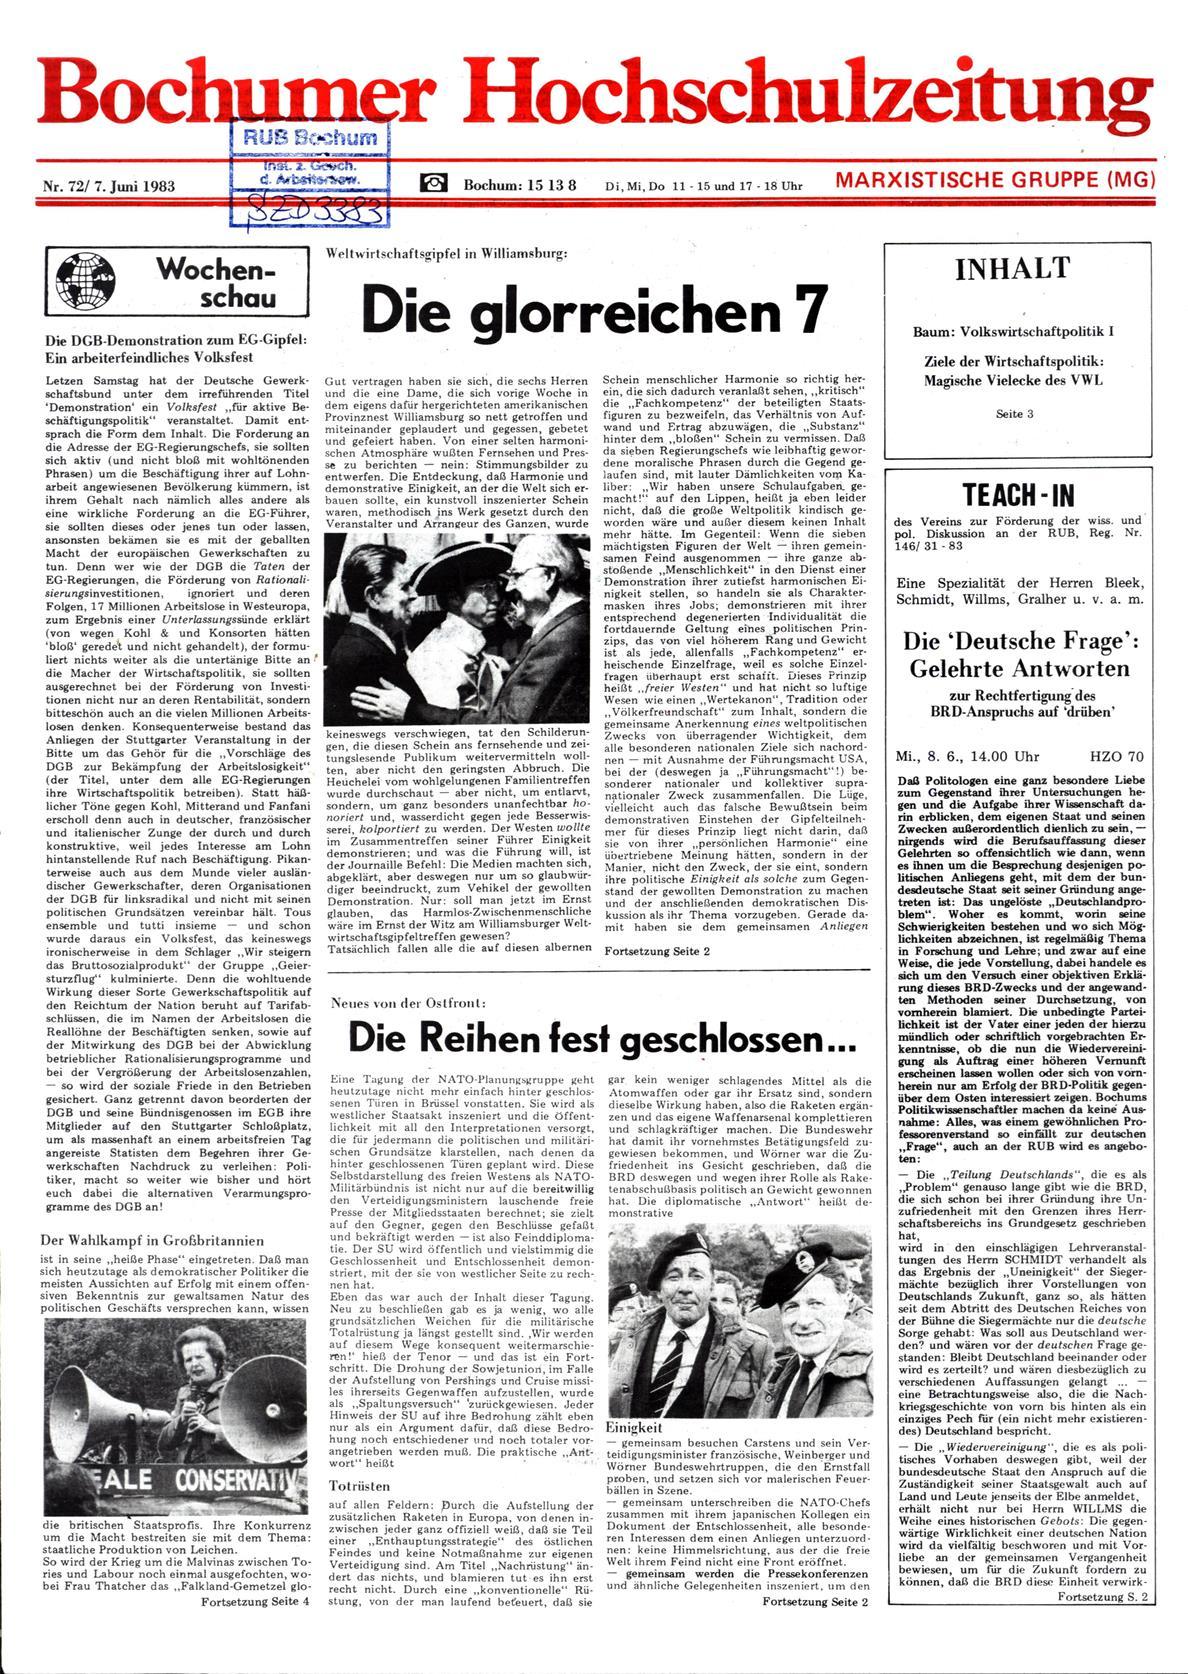 Bochum_BHZ_19830607_072_001